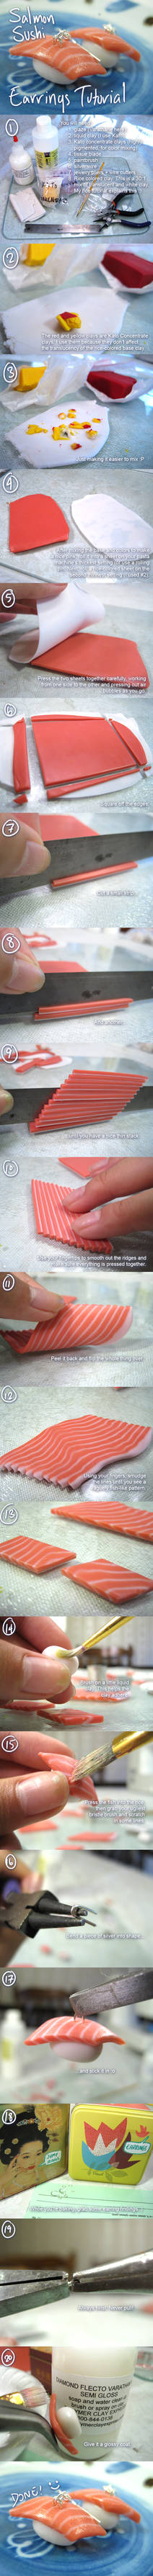 Salmon sushi earrings tutorial